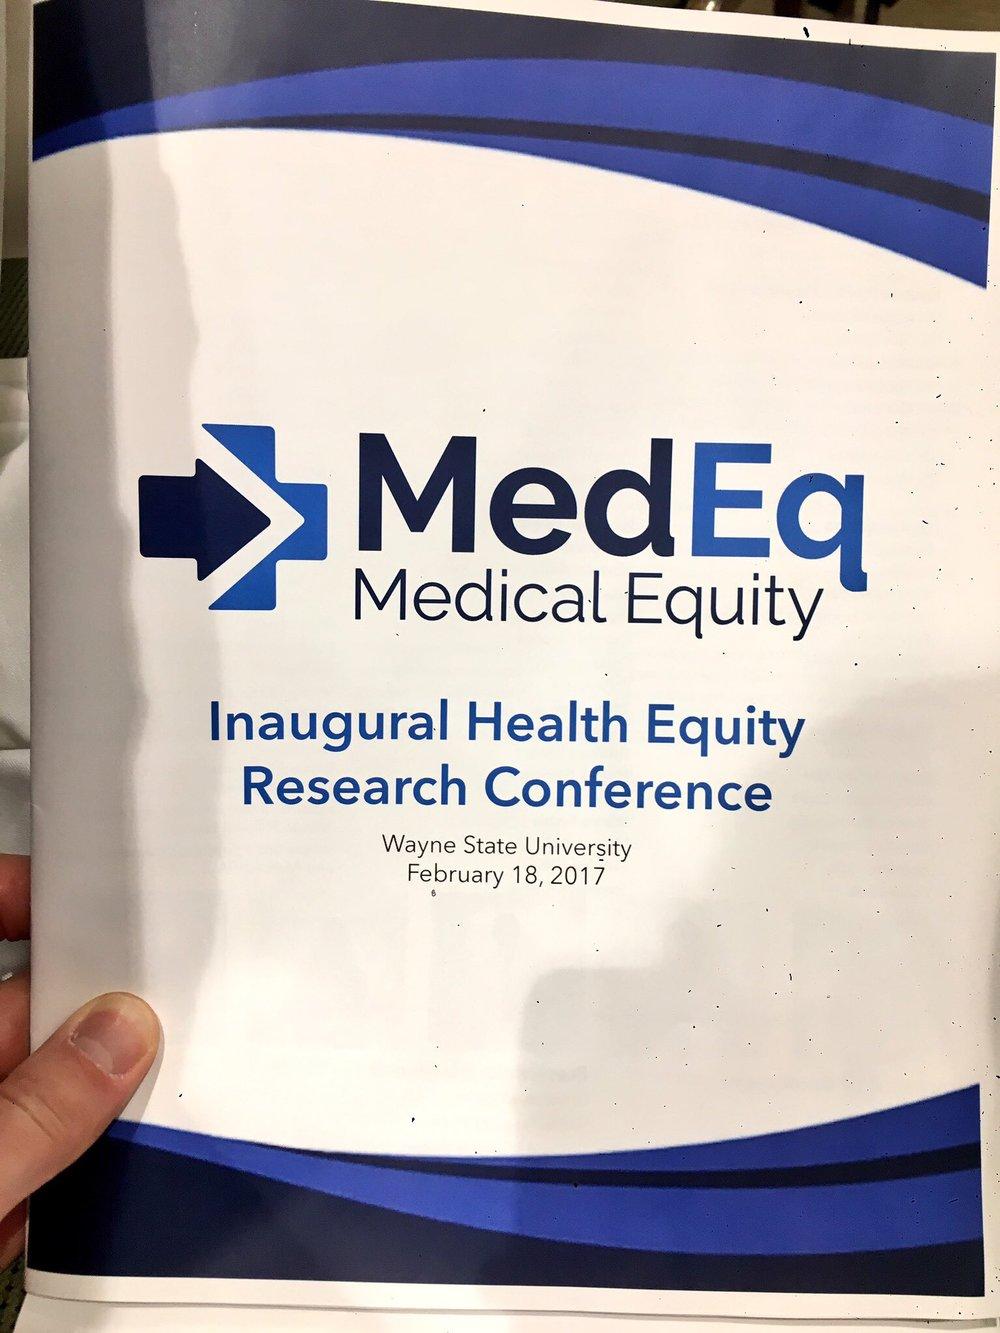 Plum Health Medical Equity 01.JPG